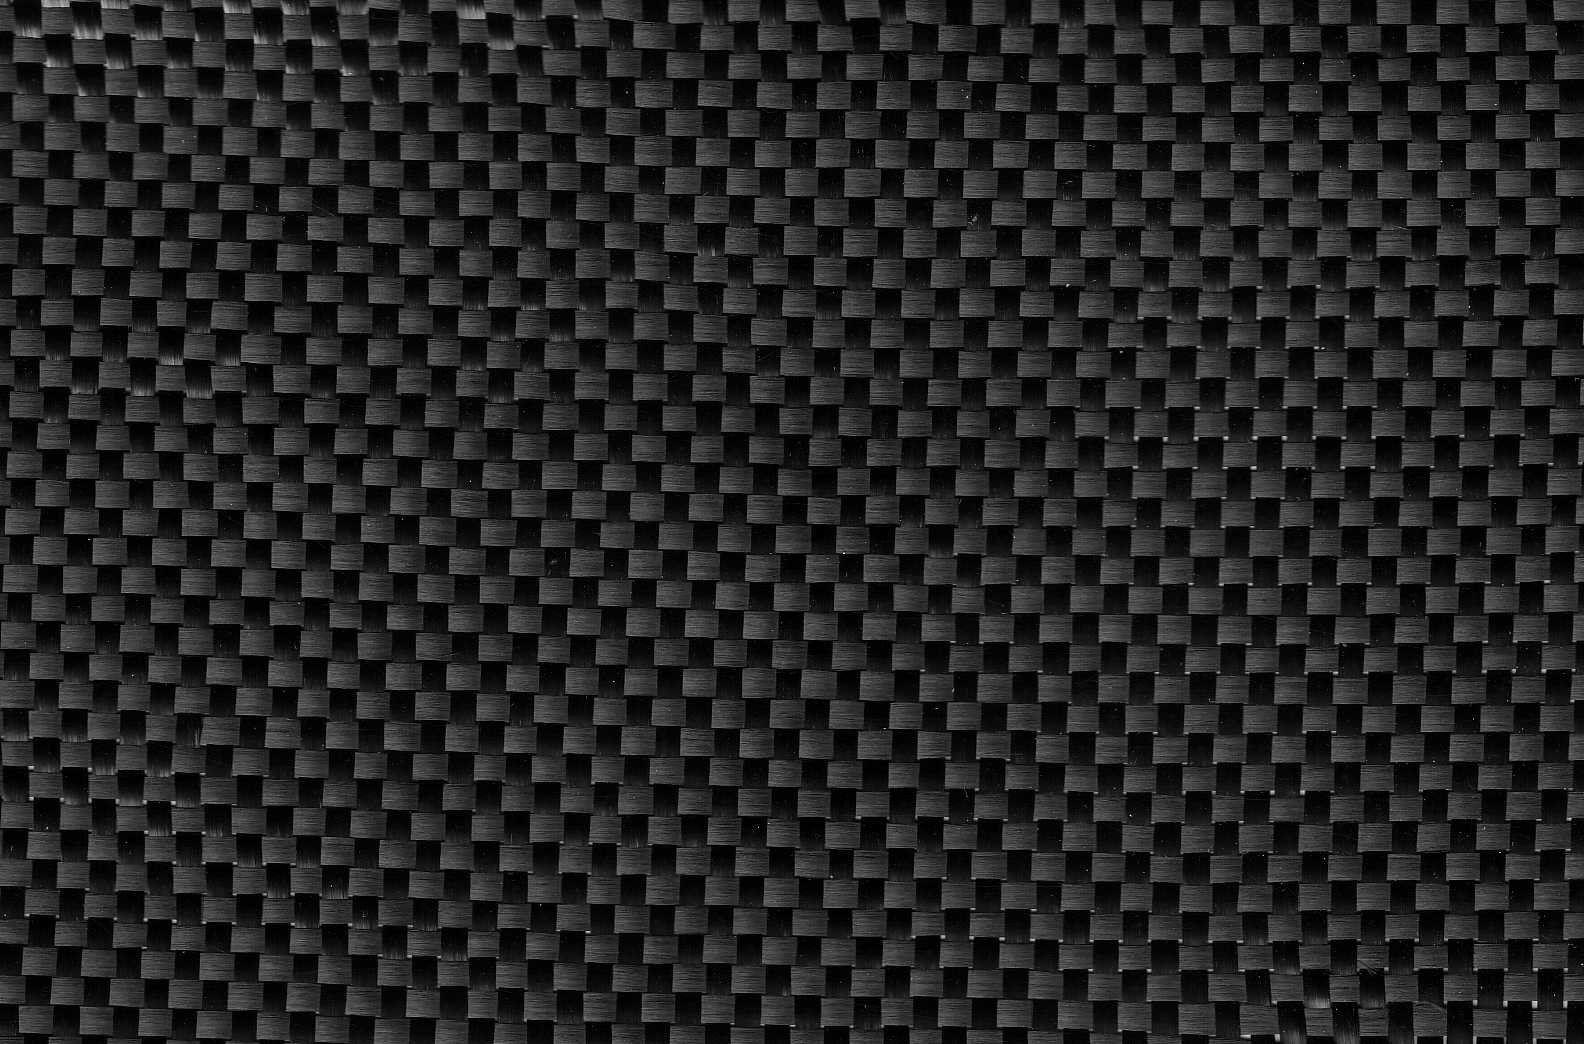 carbon fiber background texture, download background, texture ...